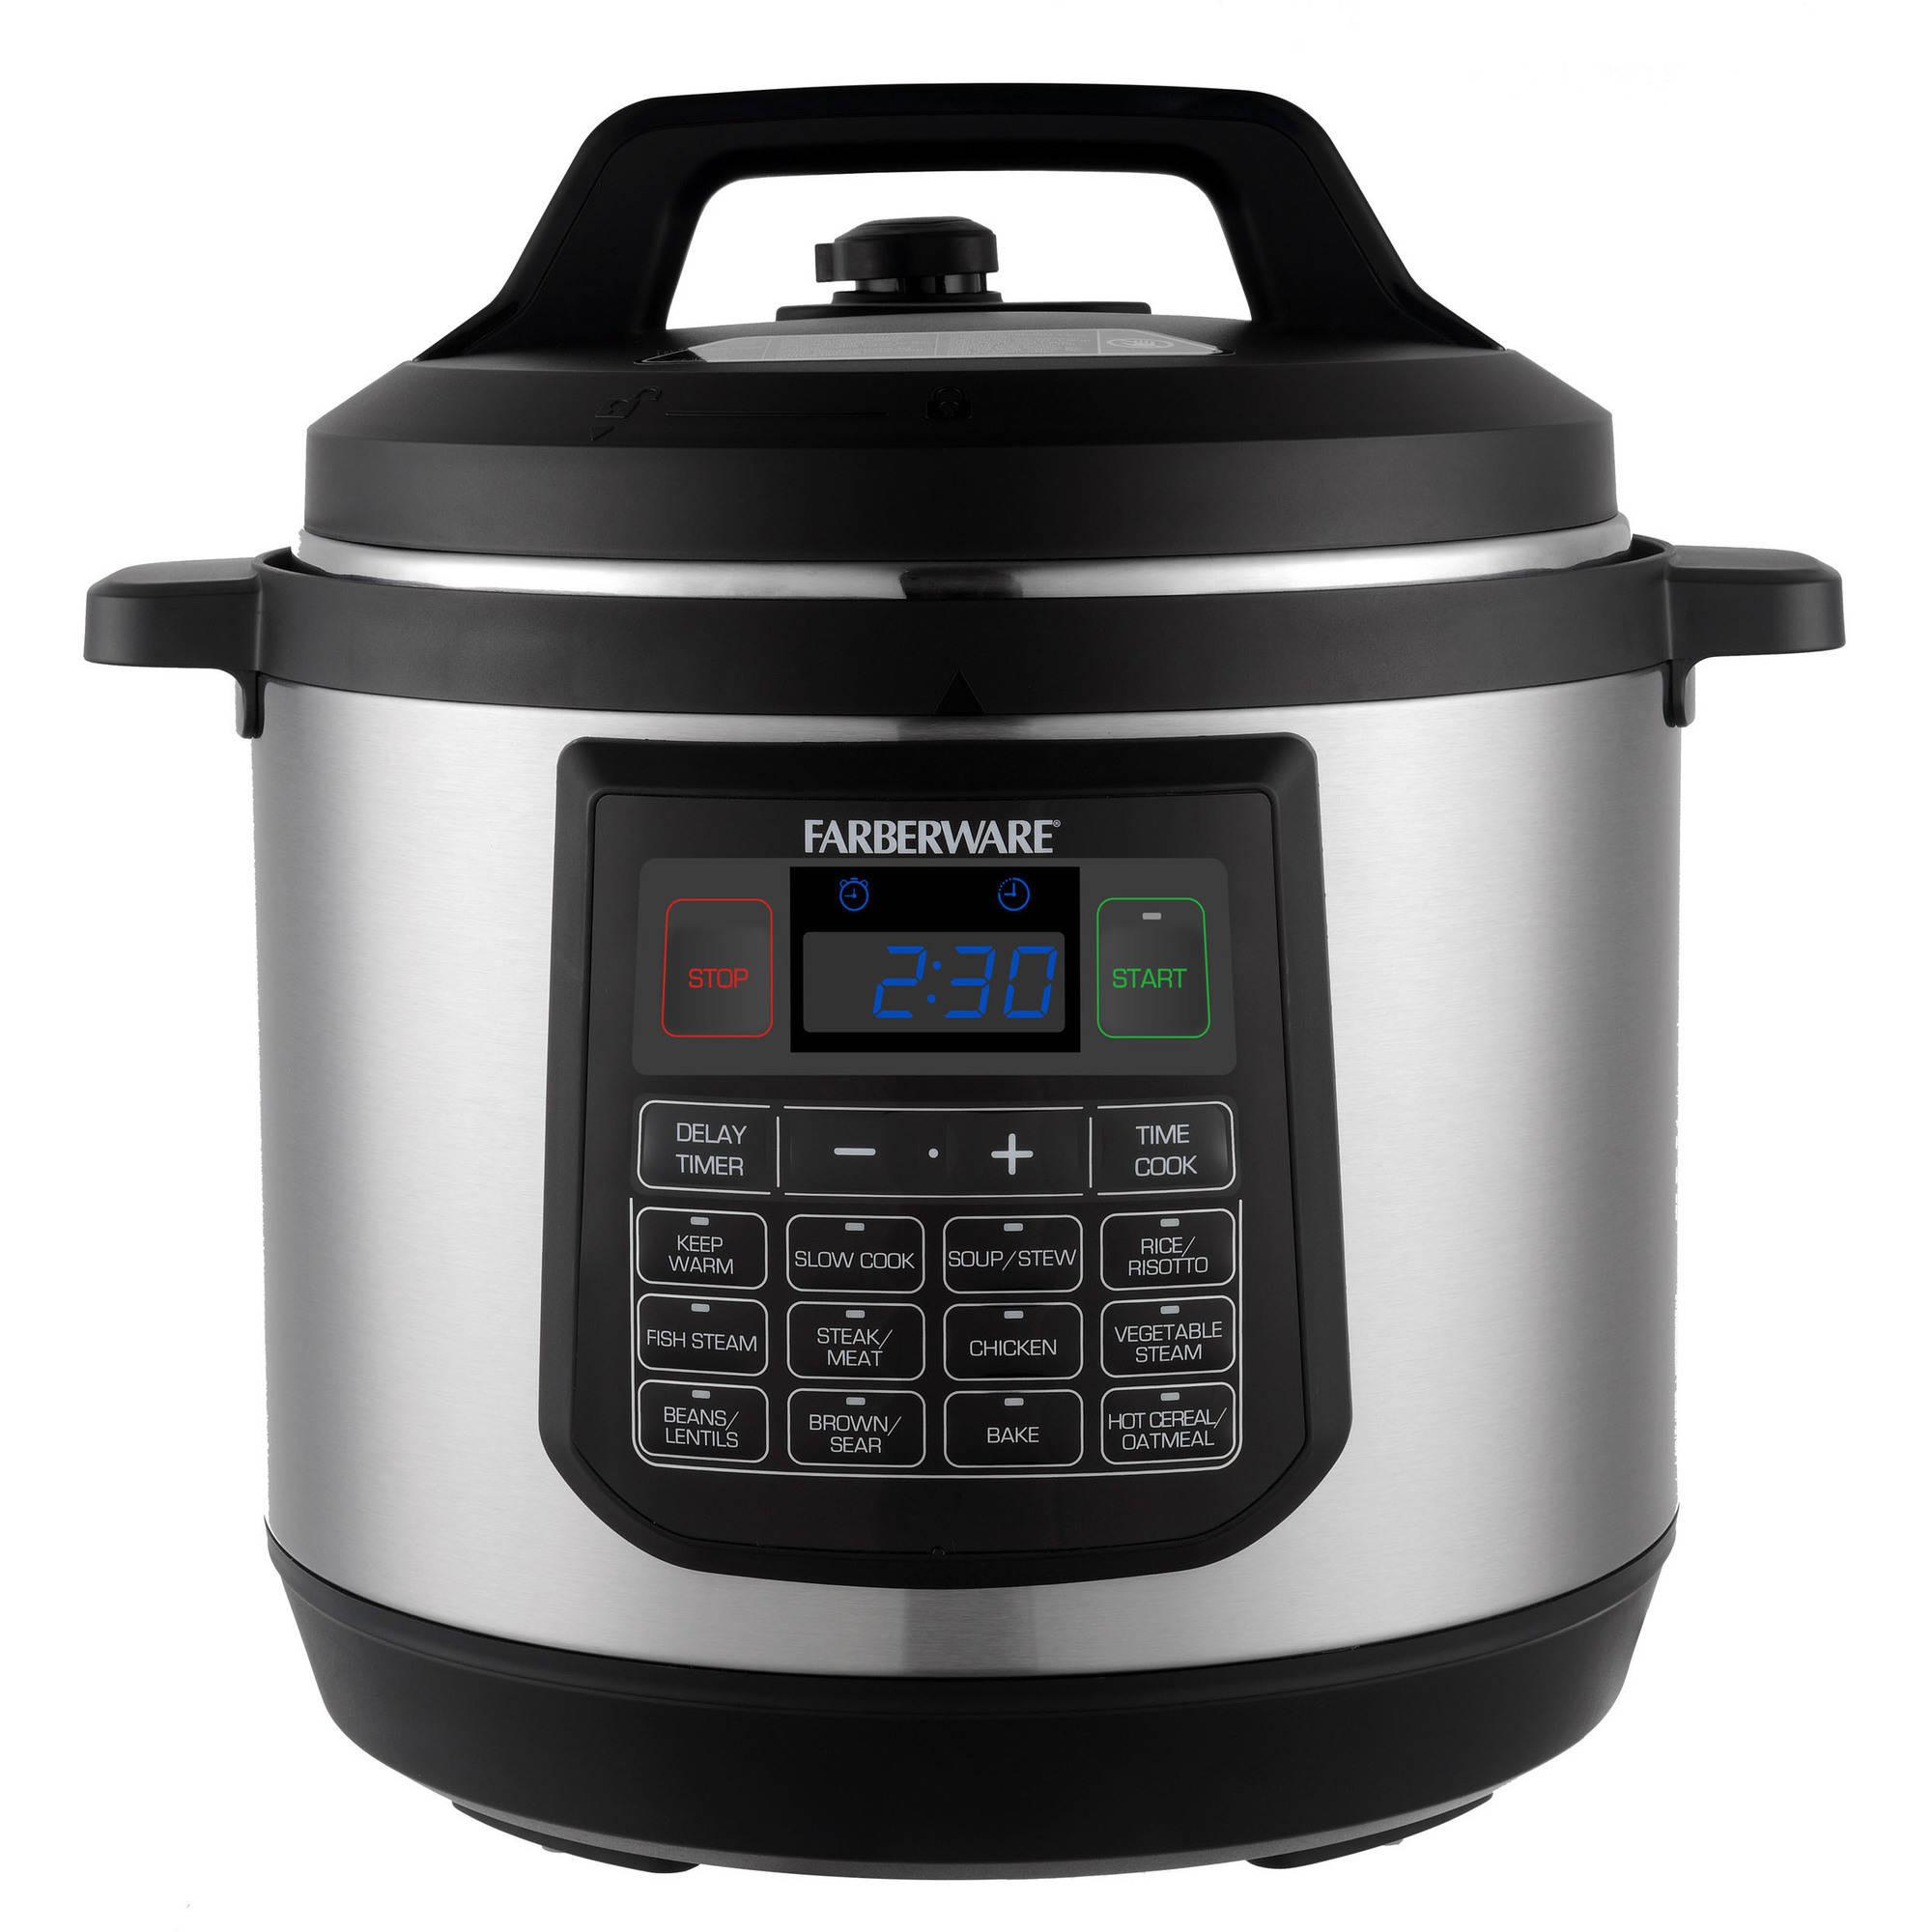 Farberware 8-Quart Pressure Cooker - Walmart.com